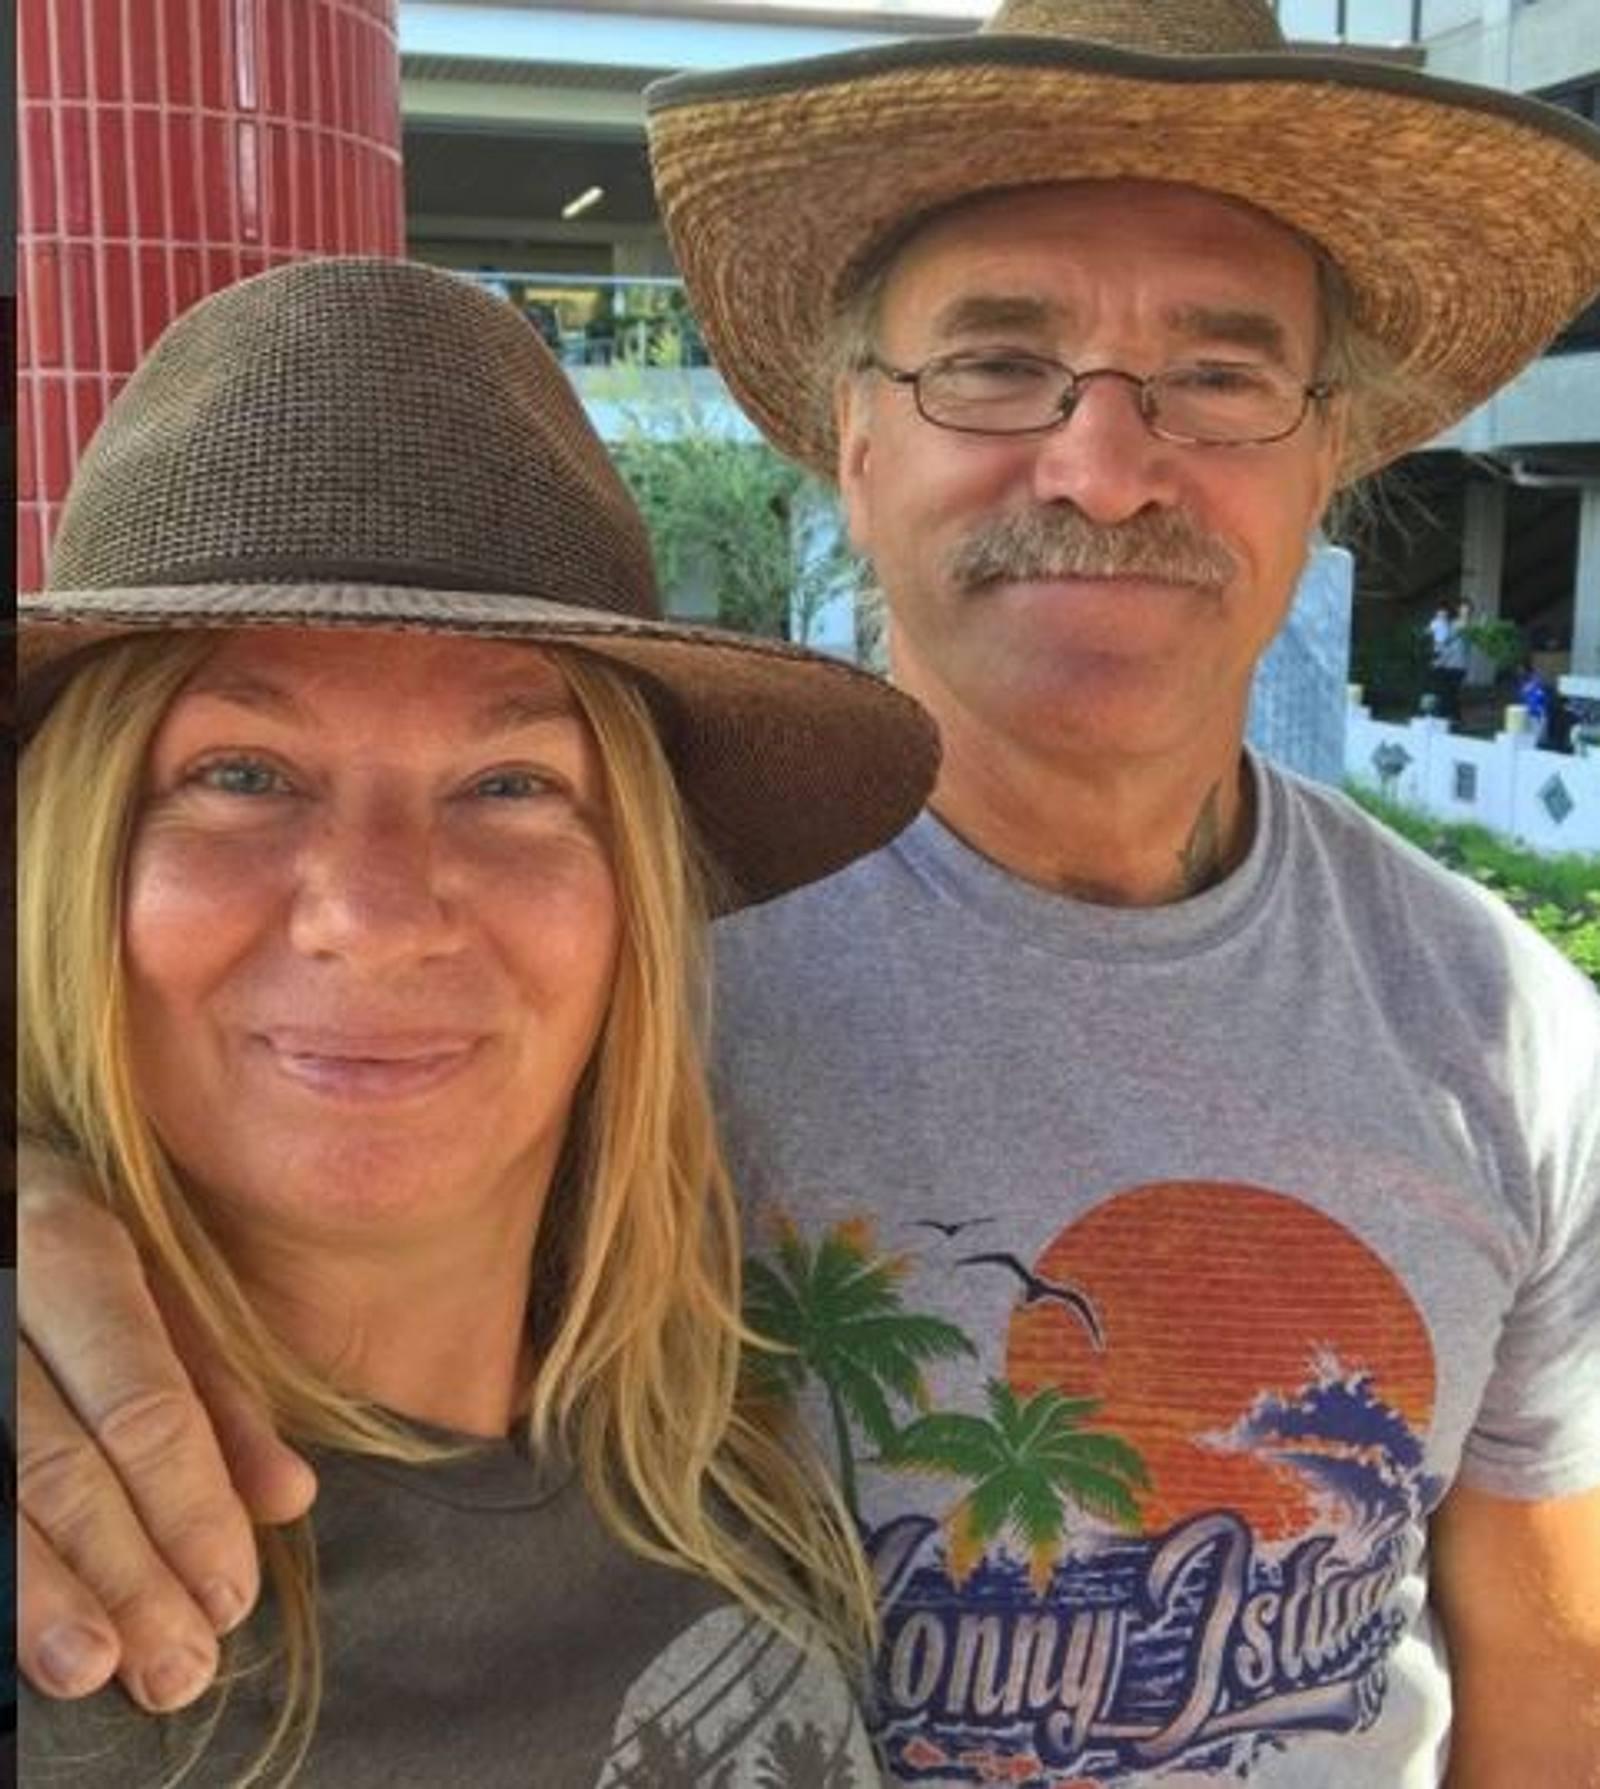 Konny Reimann Kinder Adoptiert